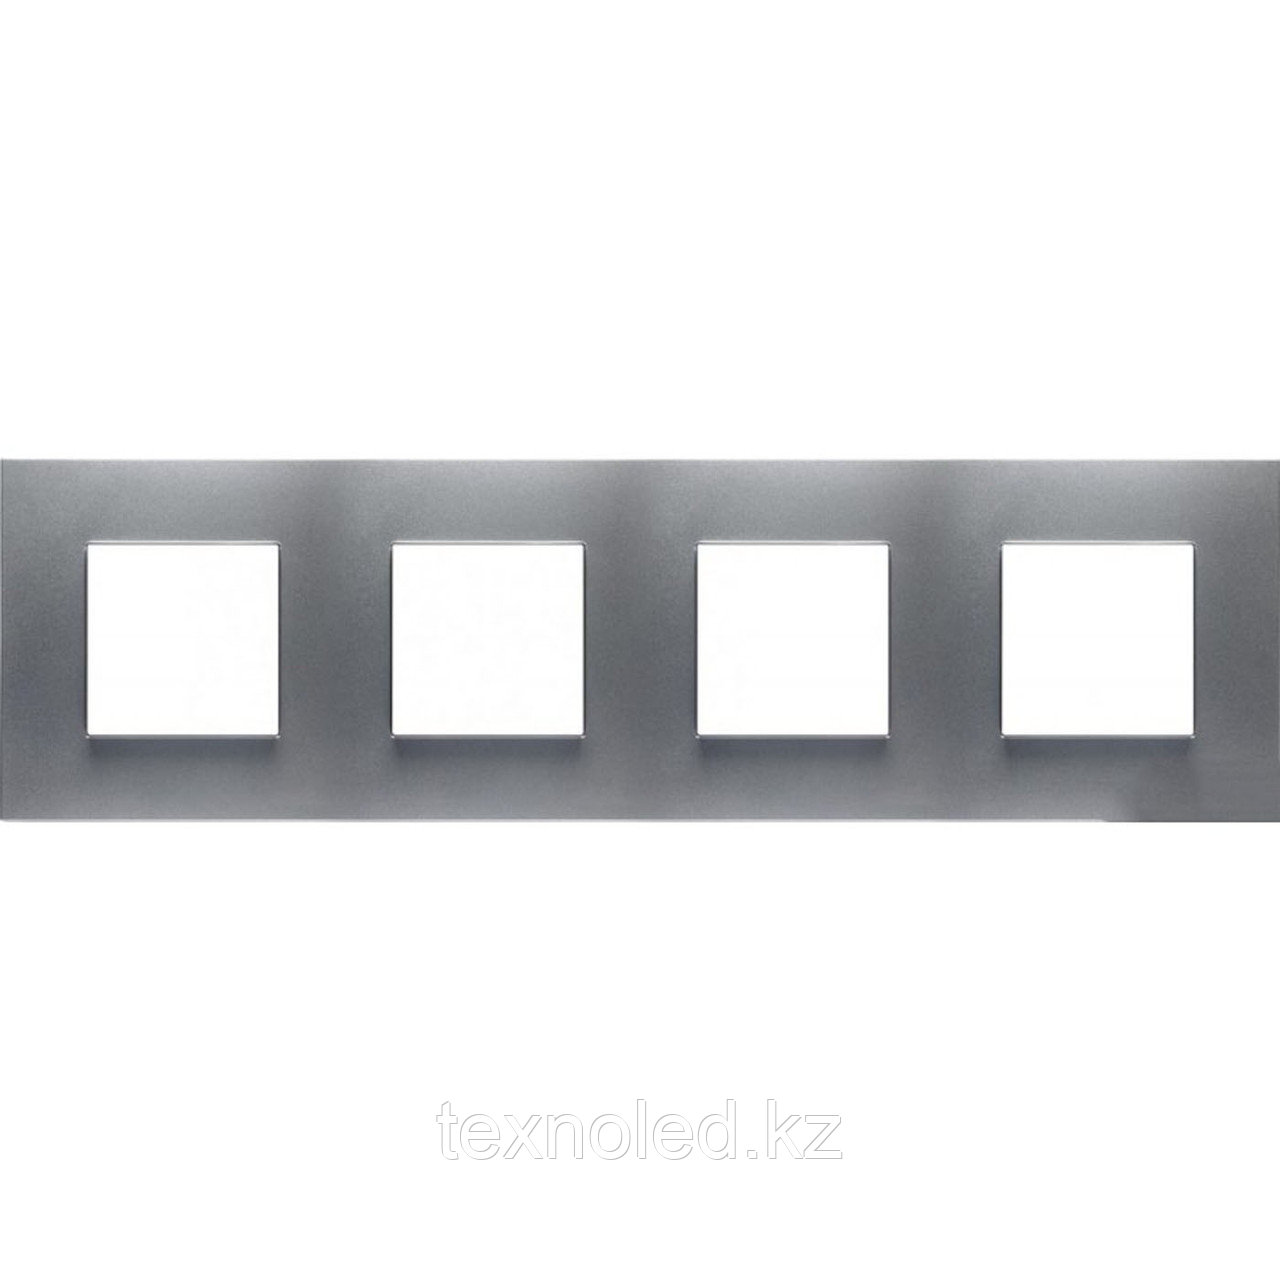 Style Aluminium Серебряная, Бронзовая, Титановая Рамка 4-Я